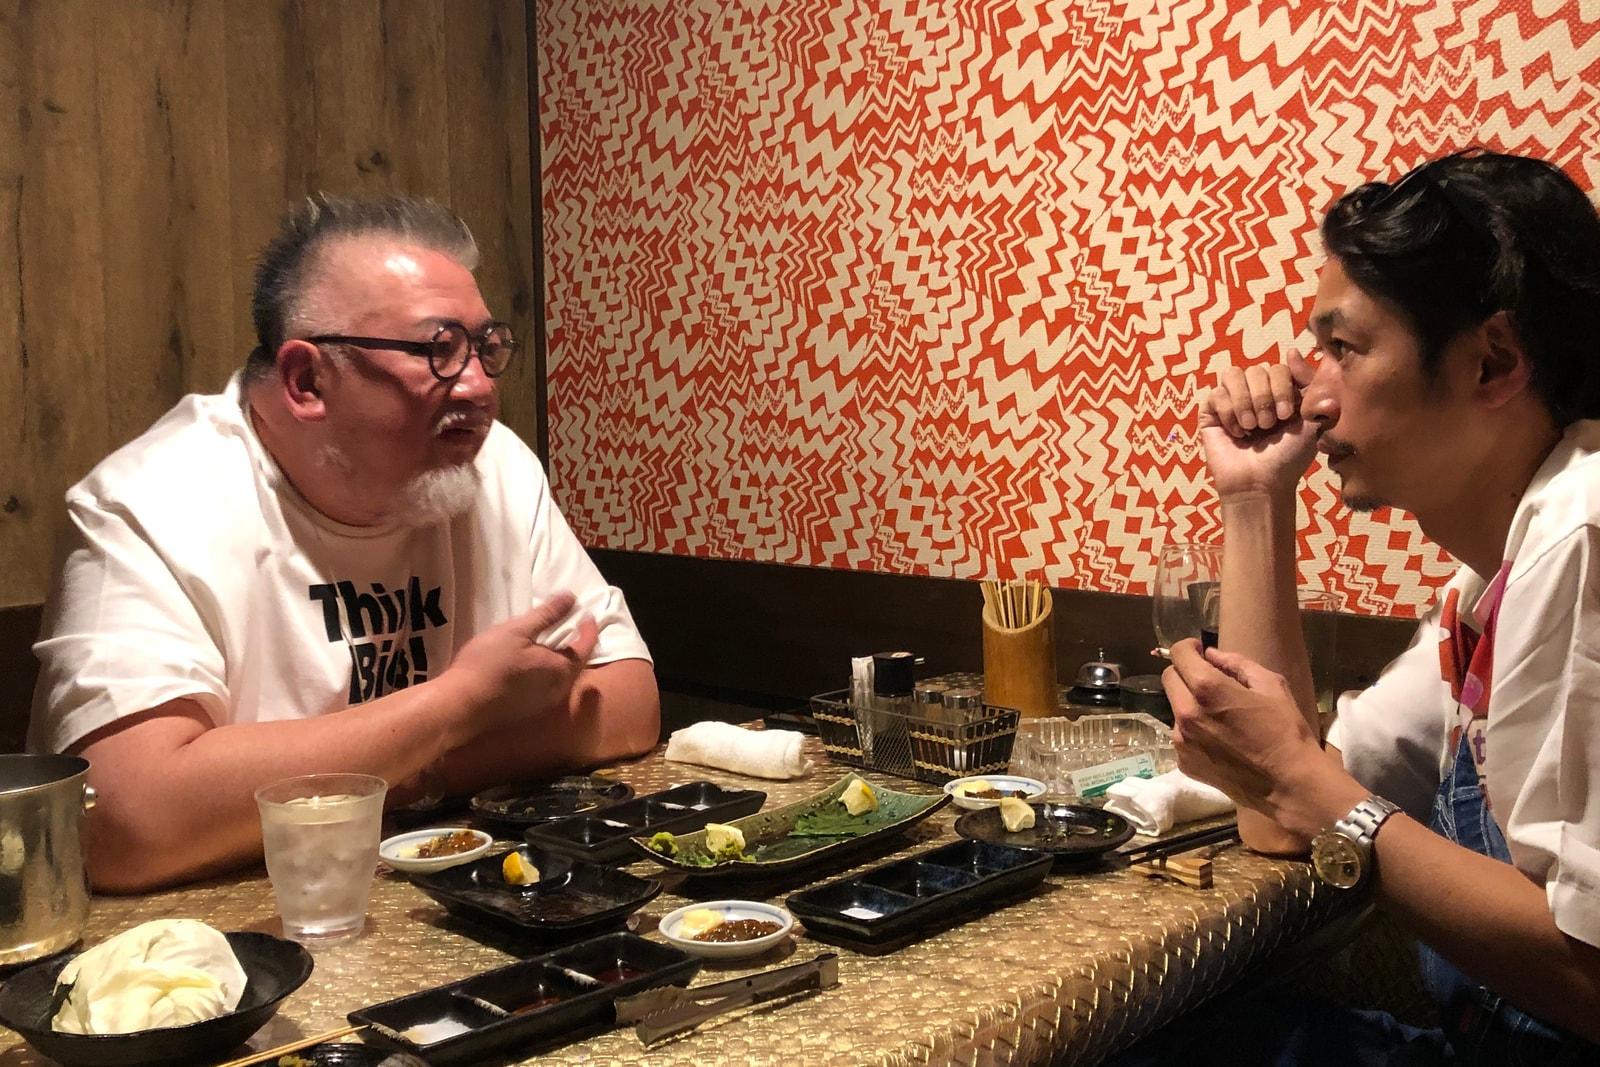 HYPEBEAST 专访 Boris Yu:80 年代开始接触时装,因一席中餐与藤原浩成为好友